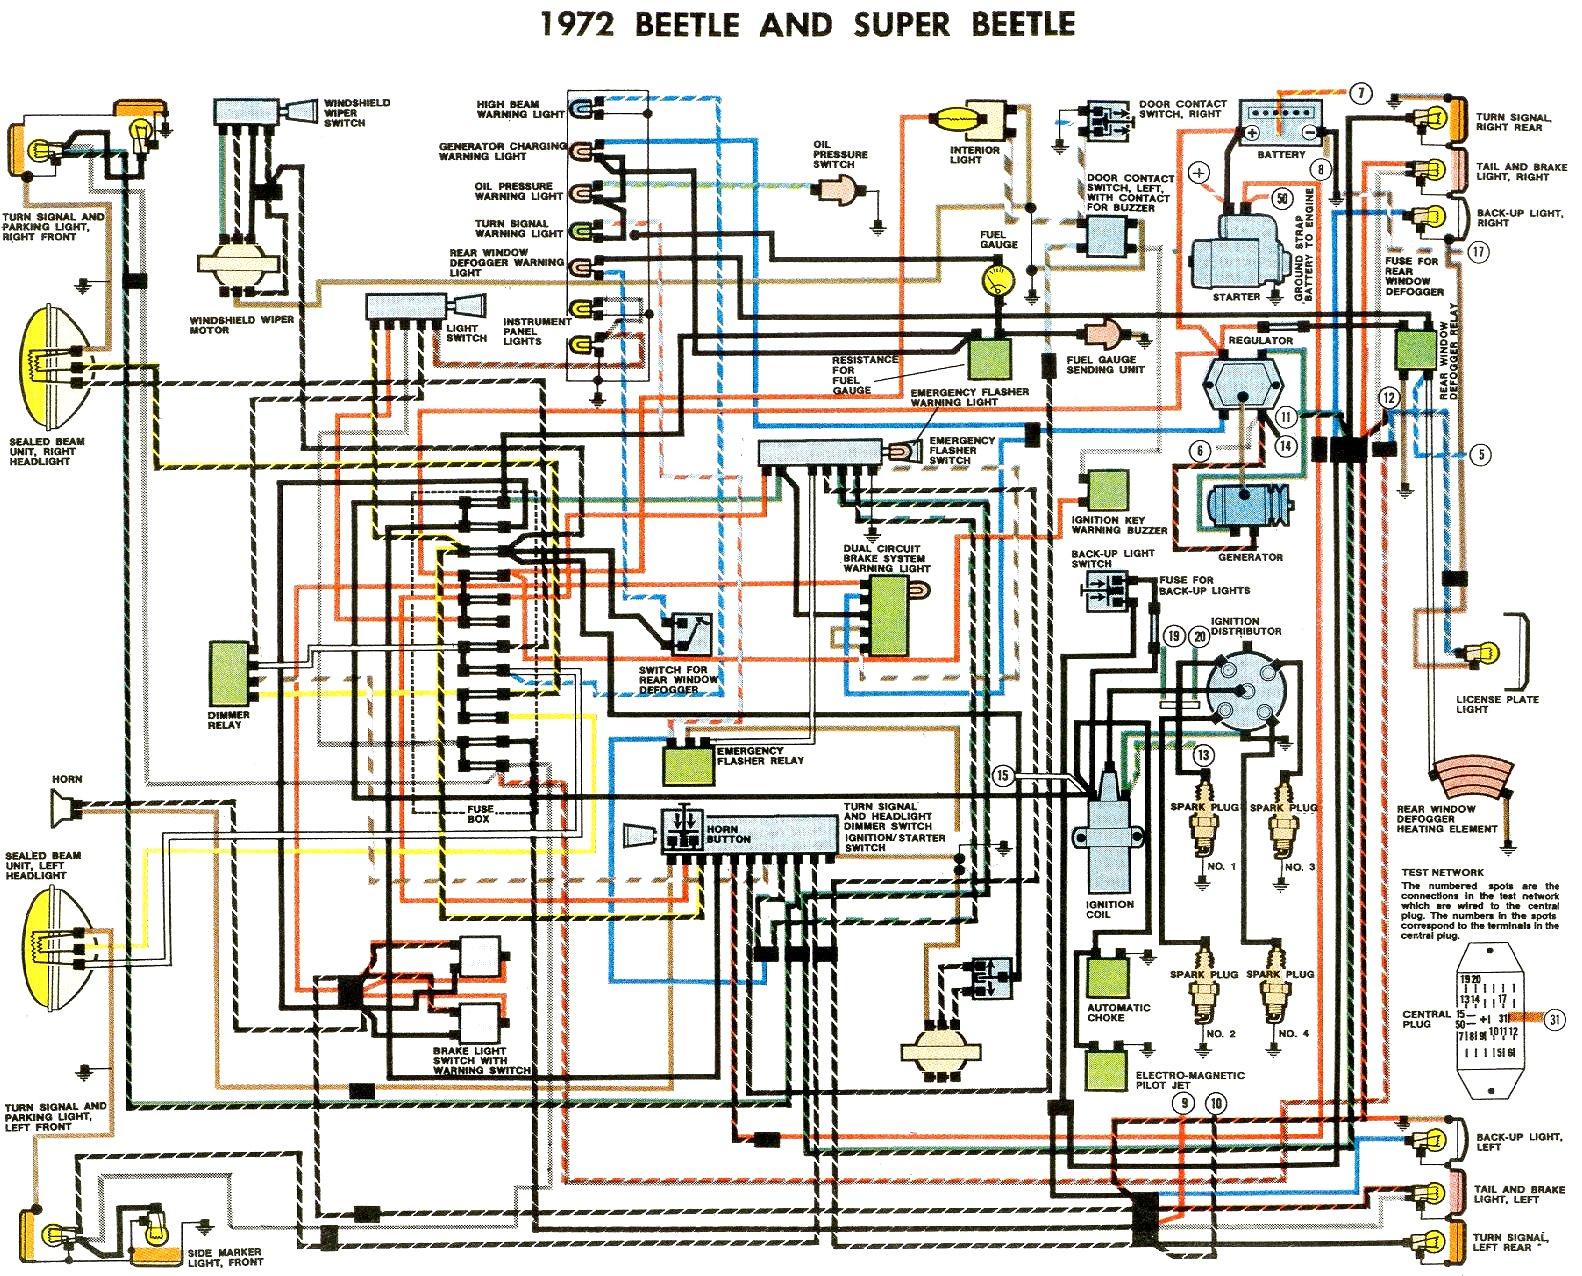 11x17 color wiring diagram 1971 vw super beetle bug wiring library volkswagen beetle diagrams vw beetle wiring diagram 1974 1961 vw bug wiring